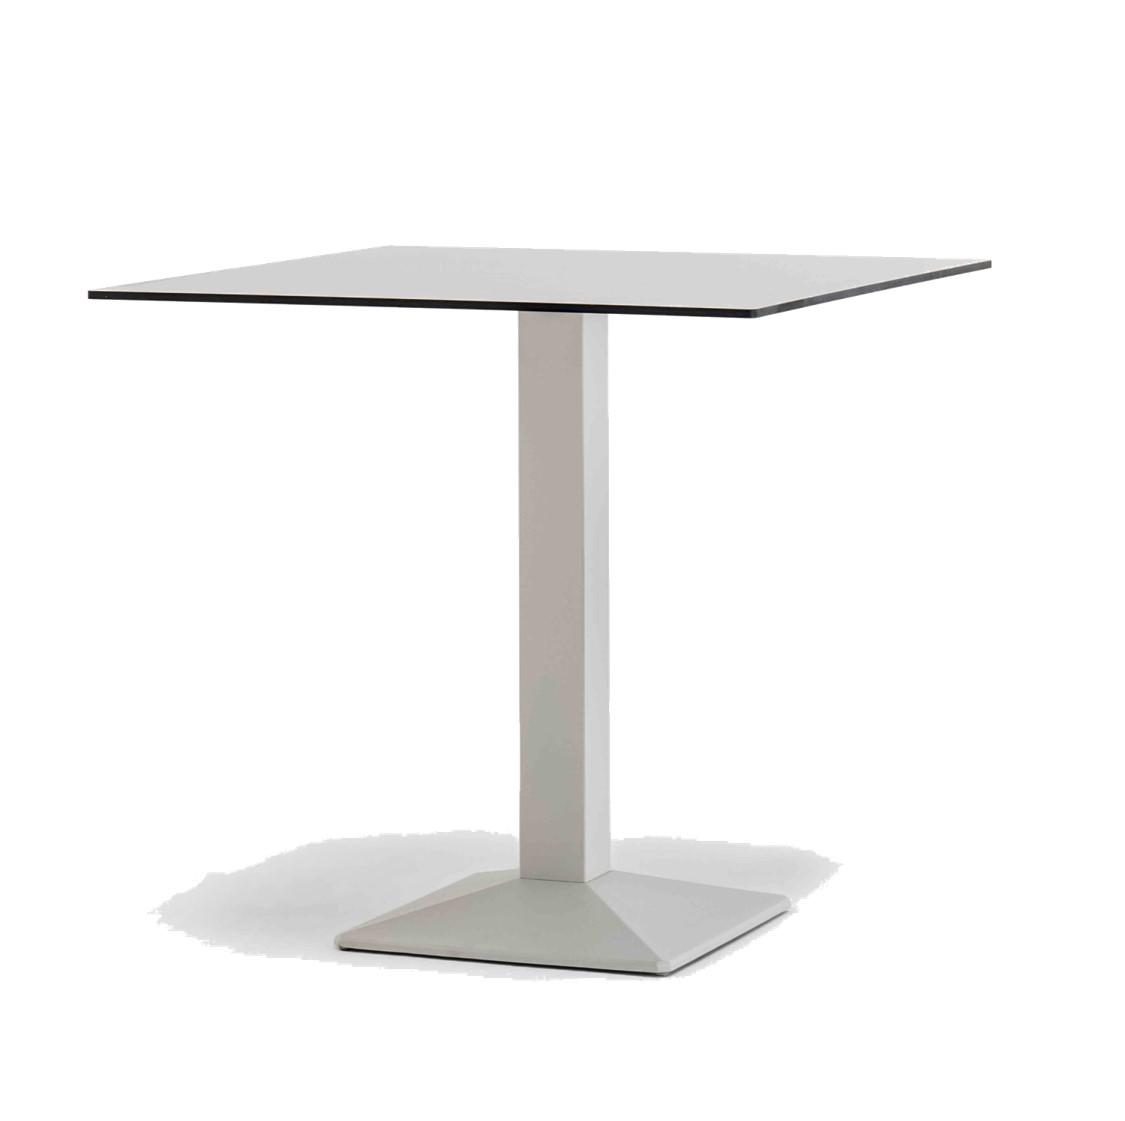 Quadra Table Base Steel Column Pyramid Base Pedrali at DeFrae Contract Furniture